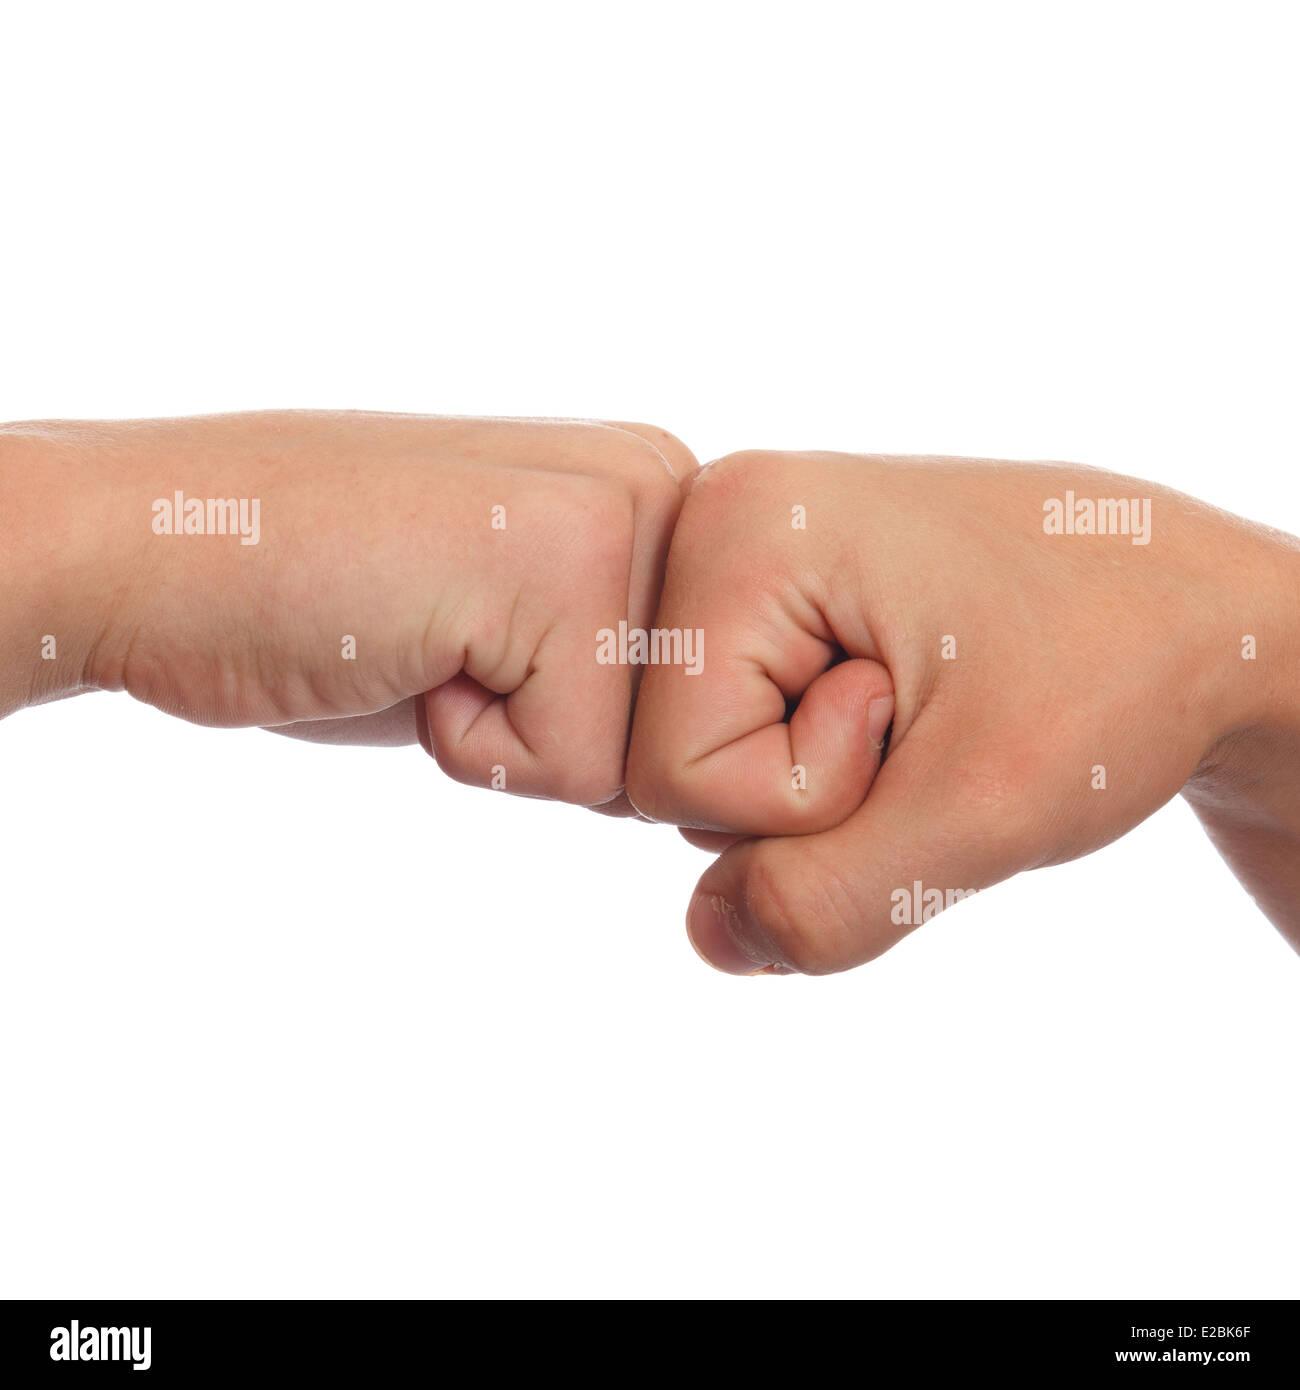 Fist greeting stock photo 70327335 alamy fist greeting m4hsunfo